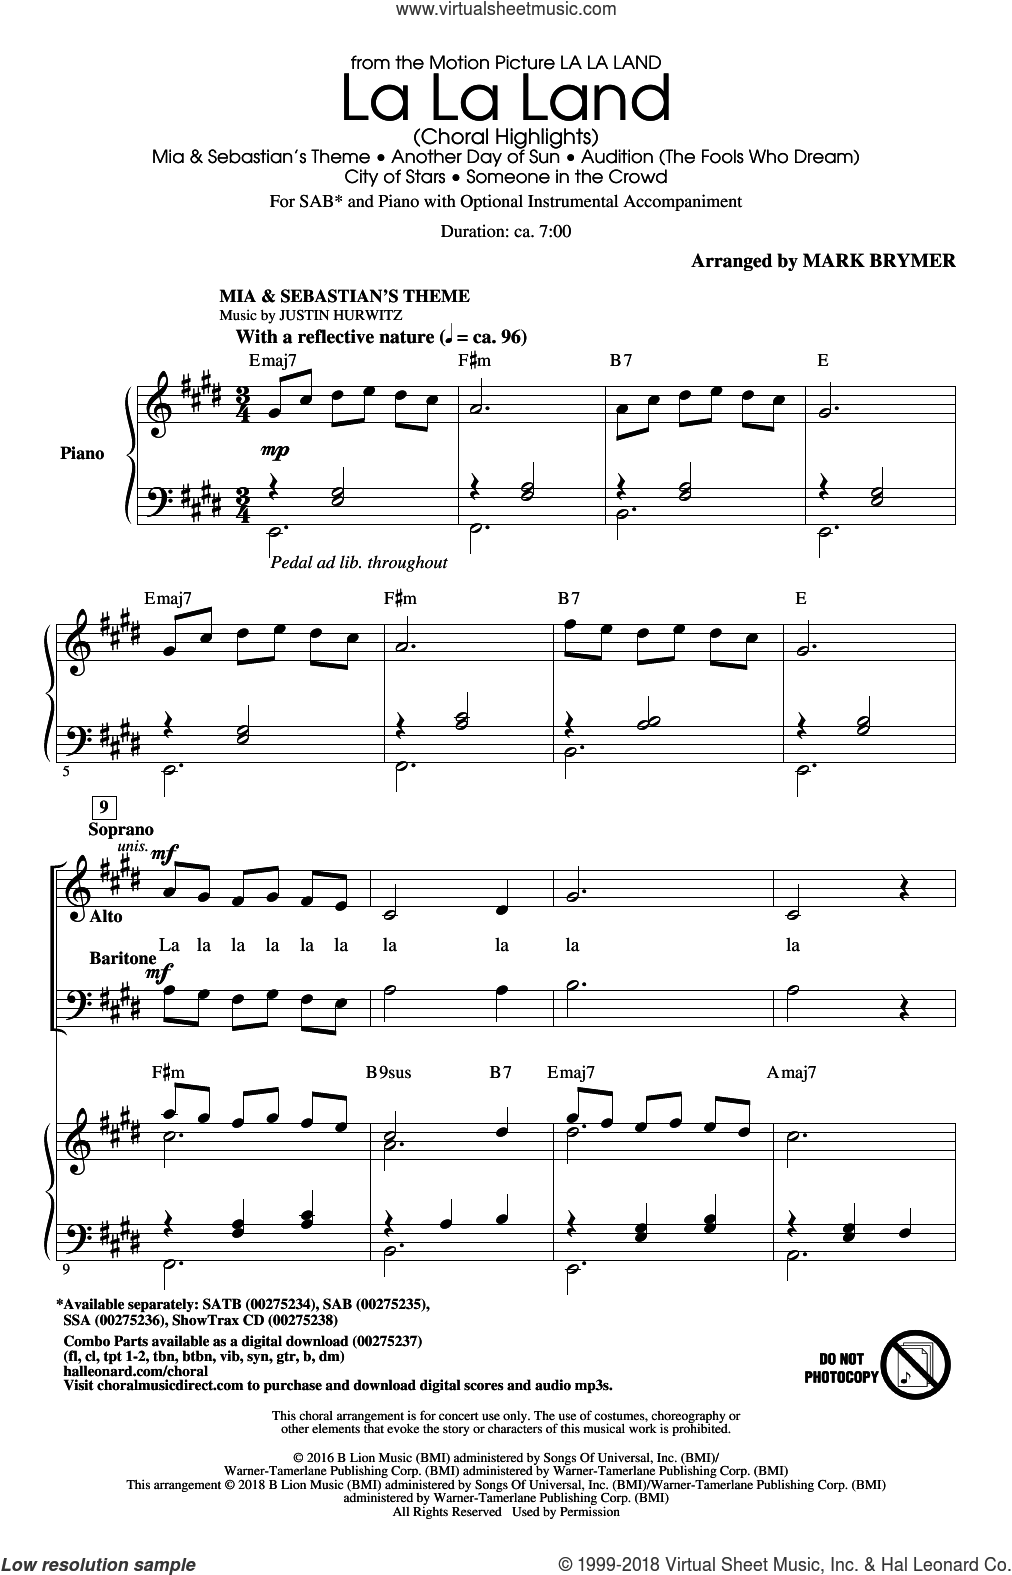 La La Land: Choral Highlights (arr. Mark Brymer) sheet music for choir (SAB: soprano, alto, bass) by Justin Paul, Mark Brymer, Benj Pasek and Justin Hurwitz, intermediate skill level